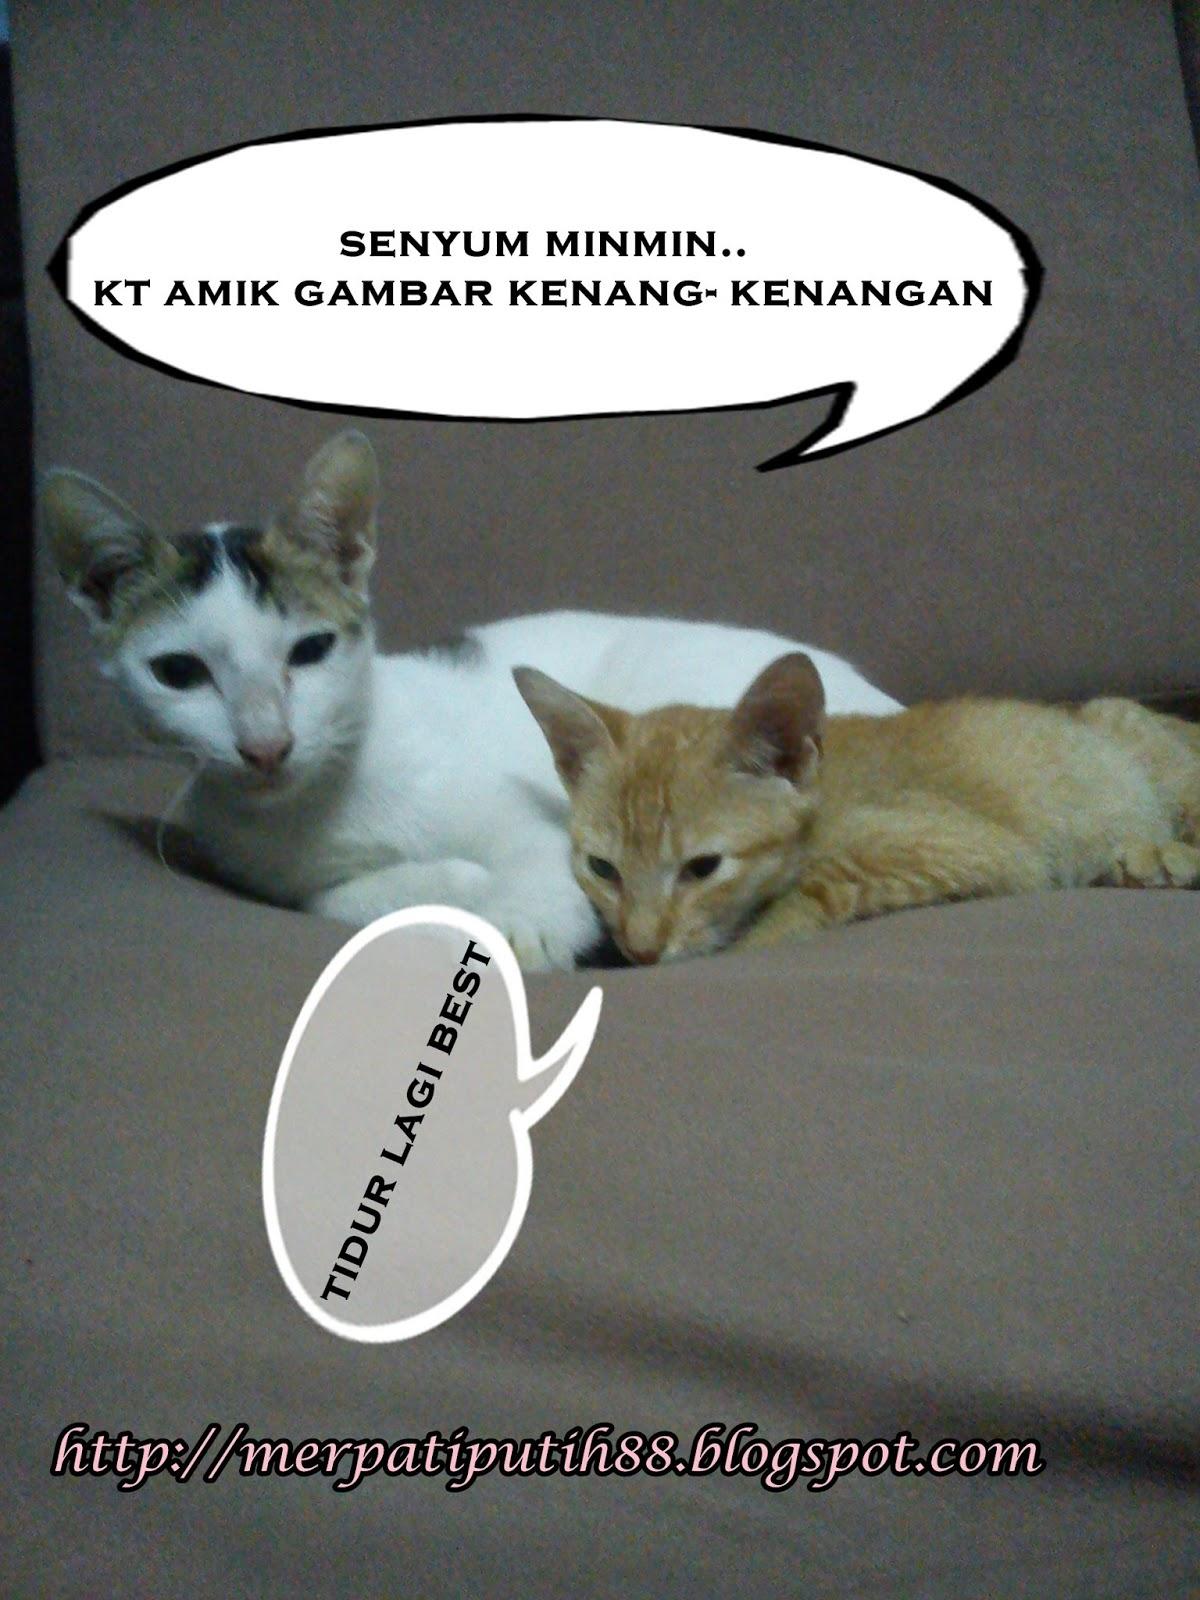 Gambar Kucing Muka Orang godean.web.id